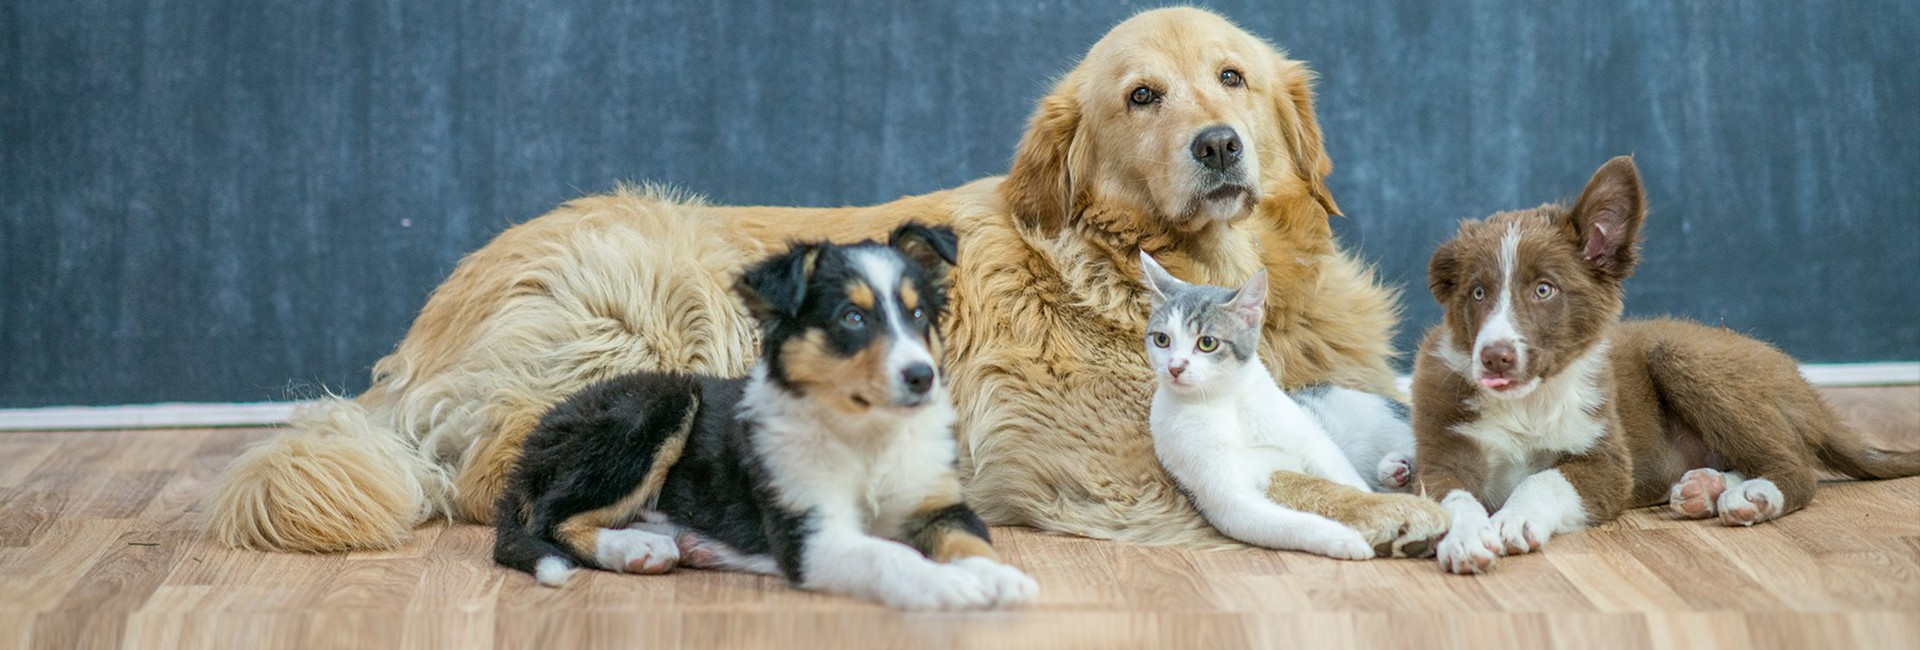 veterinaire-crahay